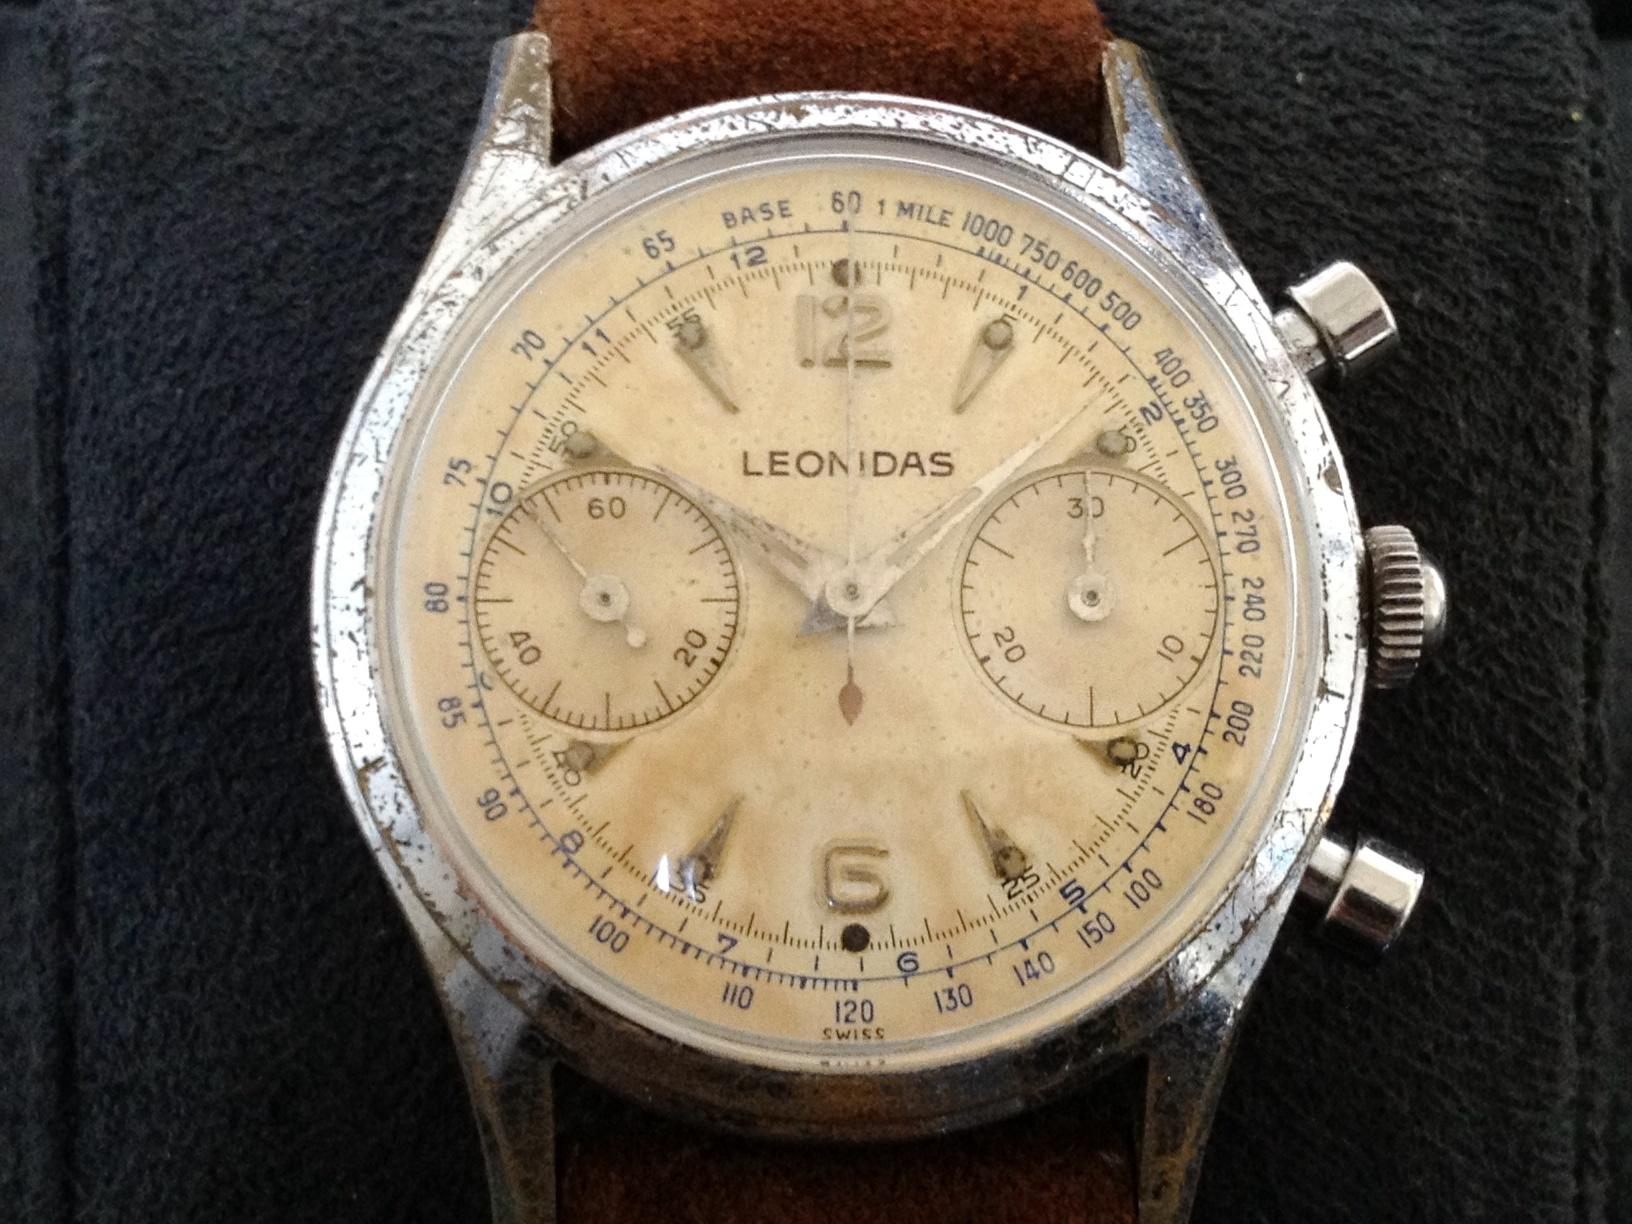 Leonidas Chronograph 137